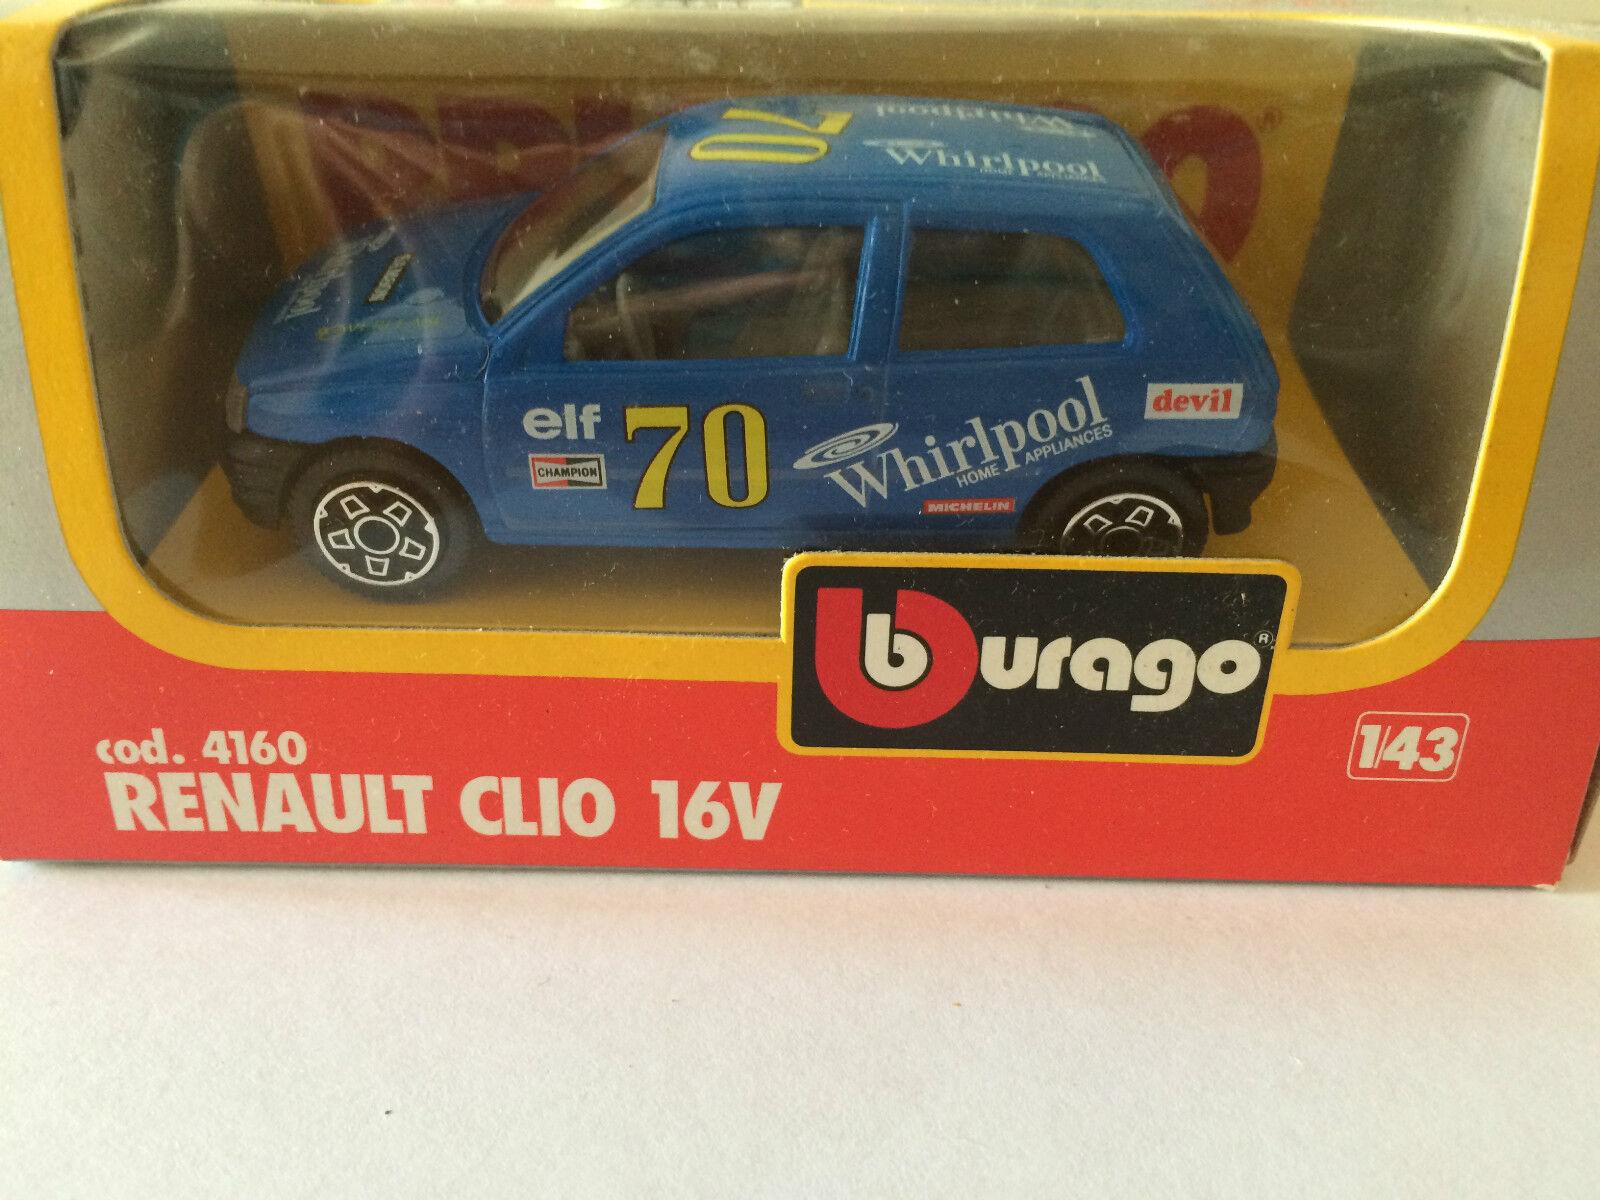 BBURAGO BURAGO RENAULT CLIO 16V COD. 4160 YEARS 1983 SCALE 1 43 IN BOX